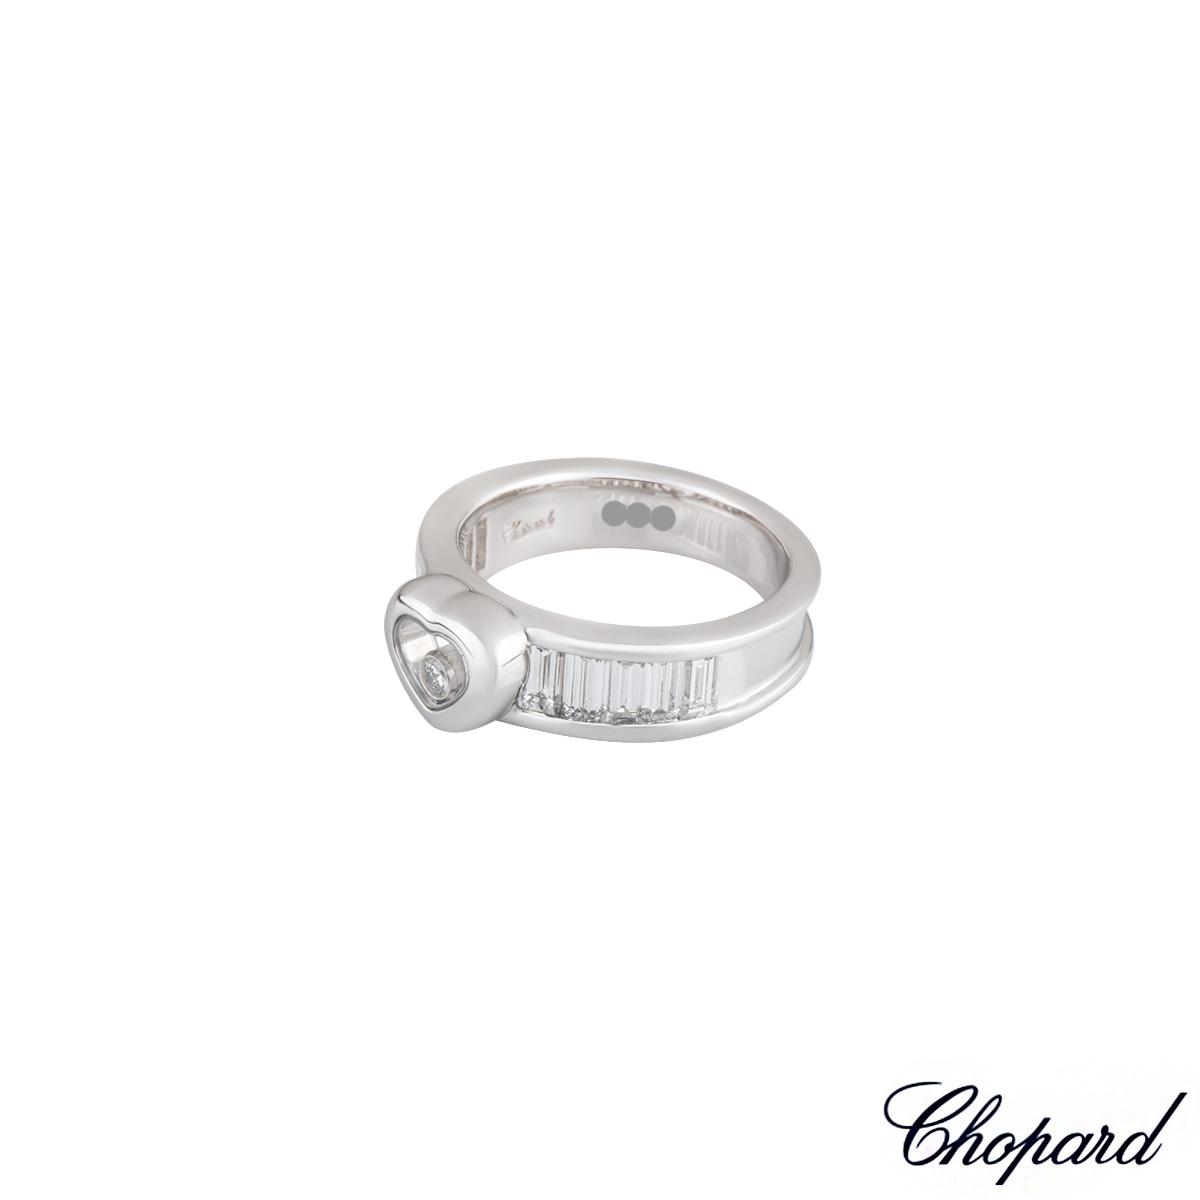 Chopard 18k White Gold Diamond Ring B&P Size N 826983-1110